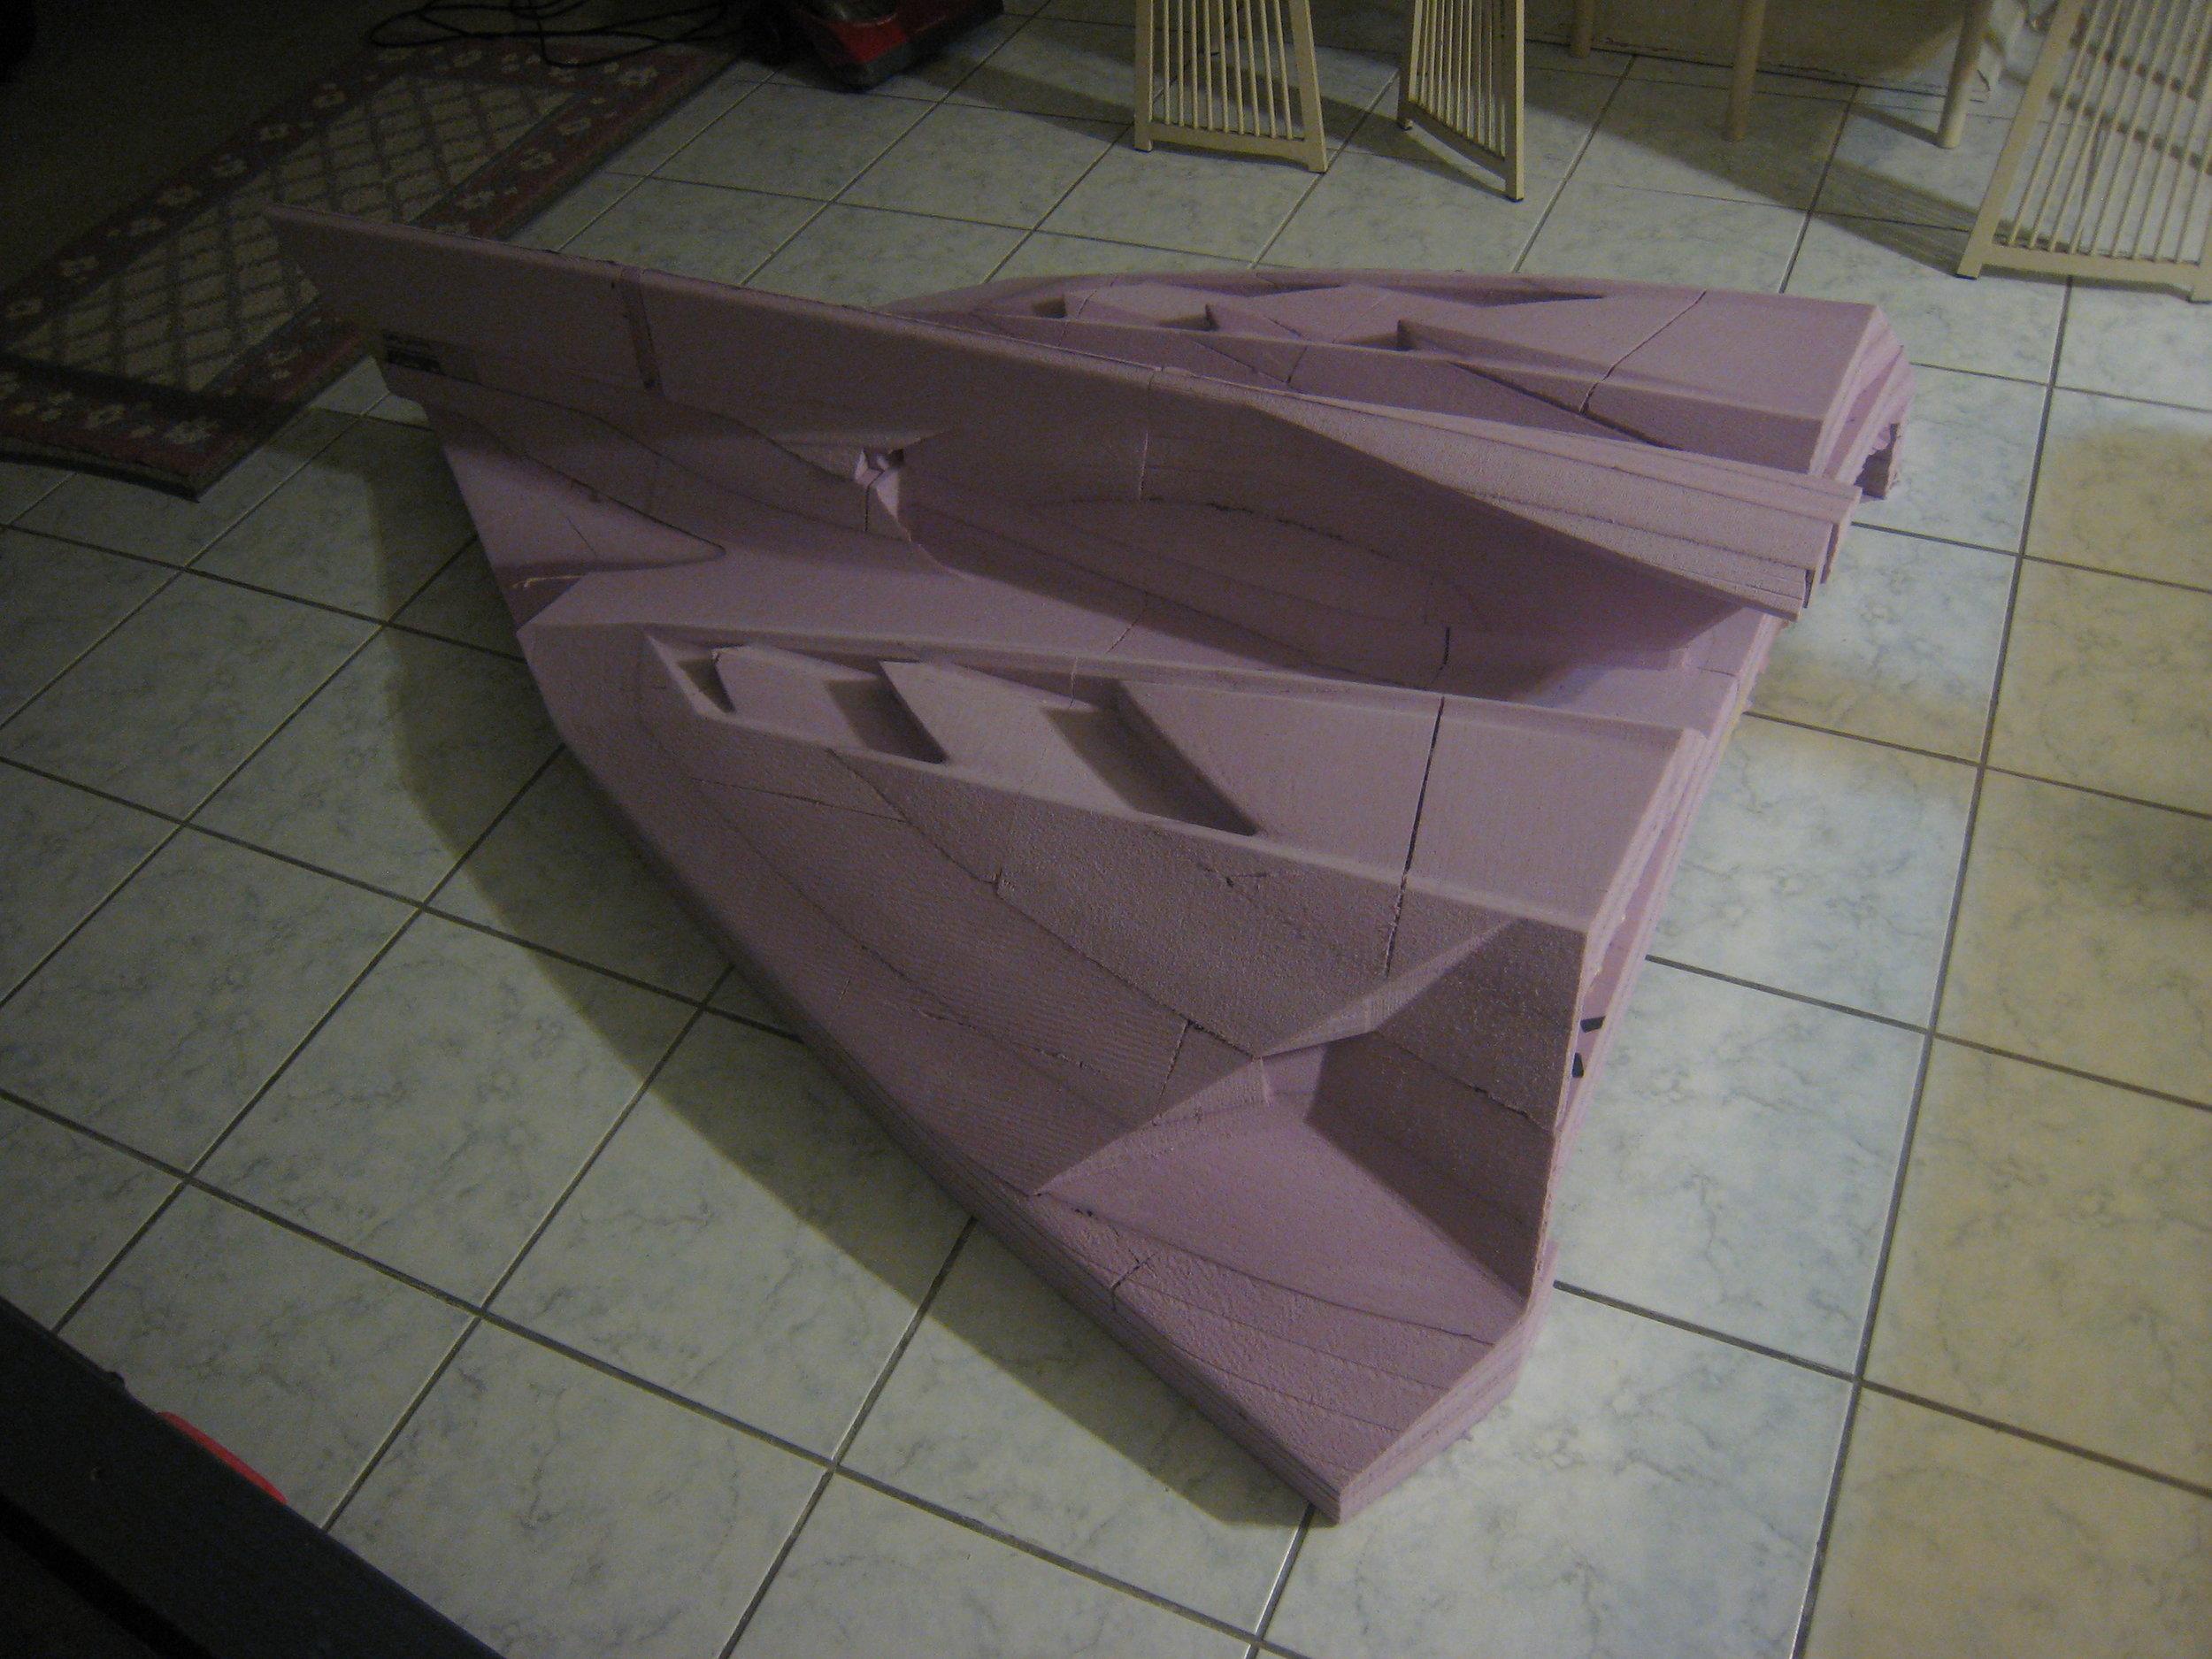 hatch3.JPG